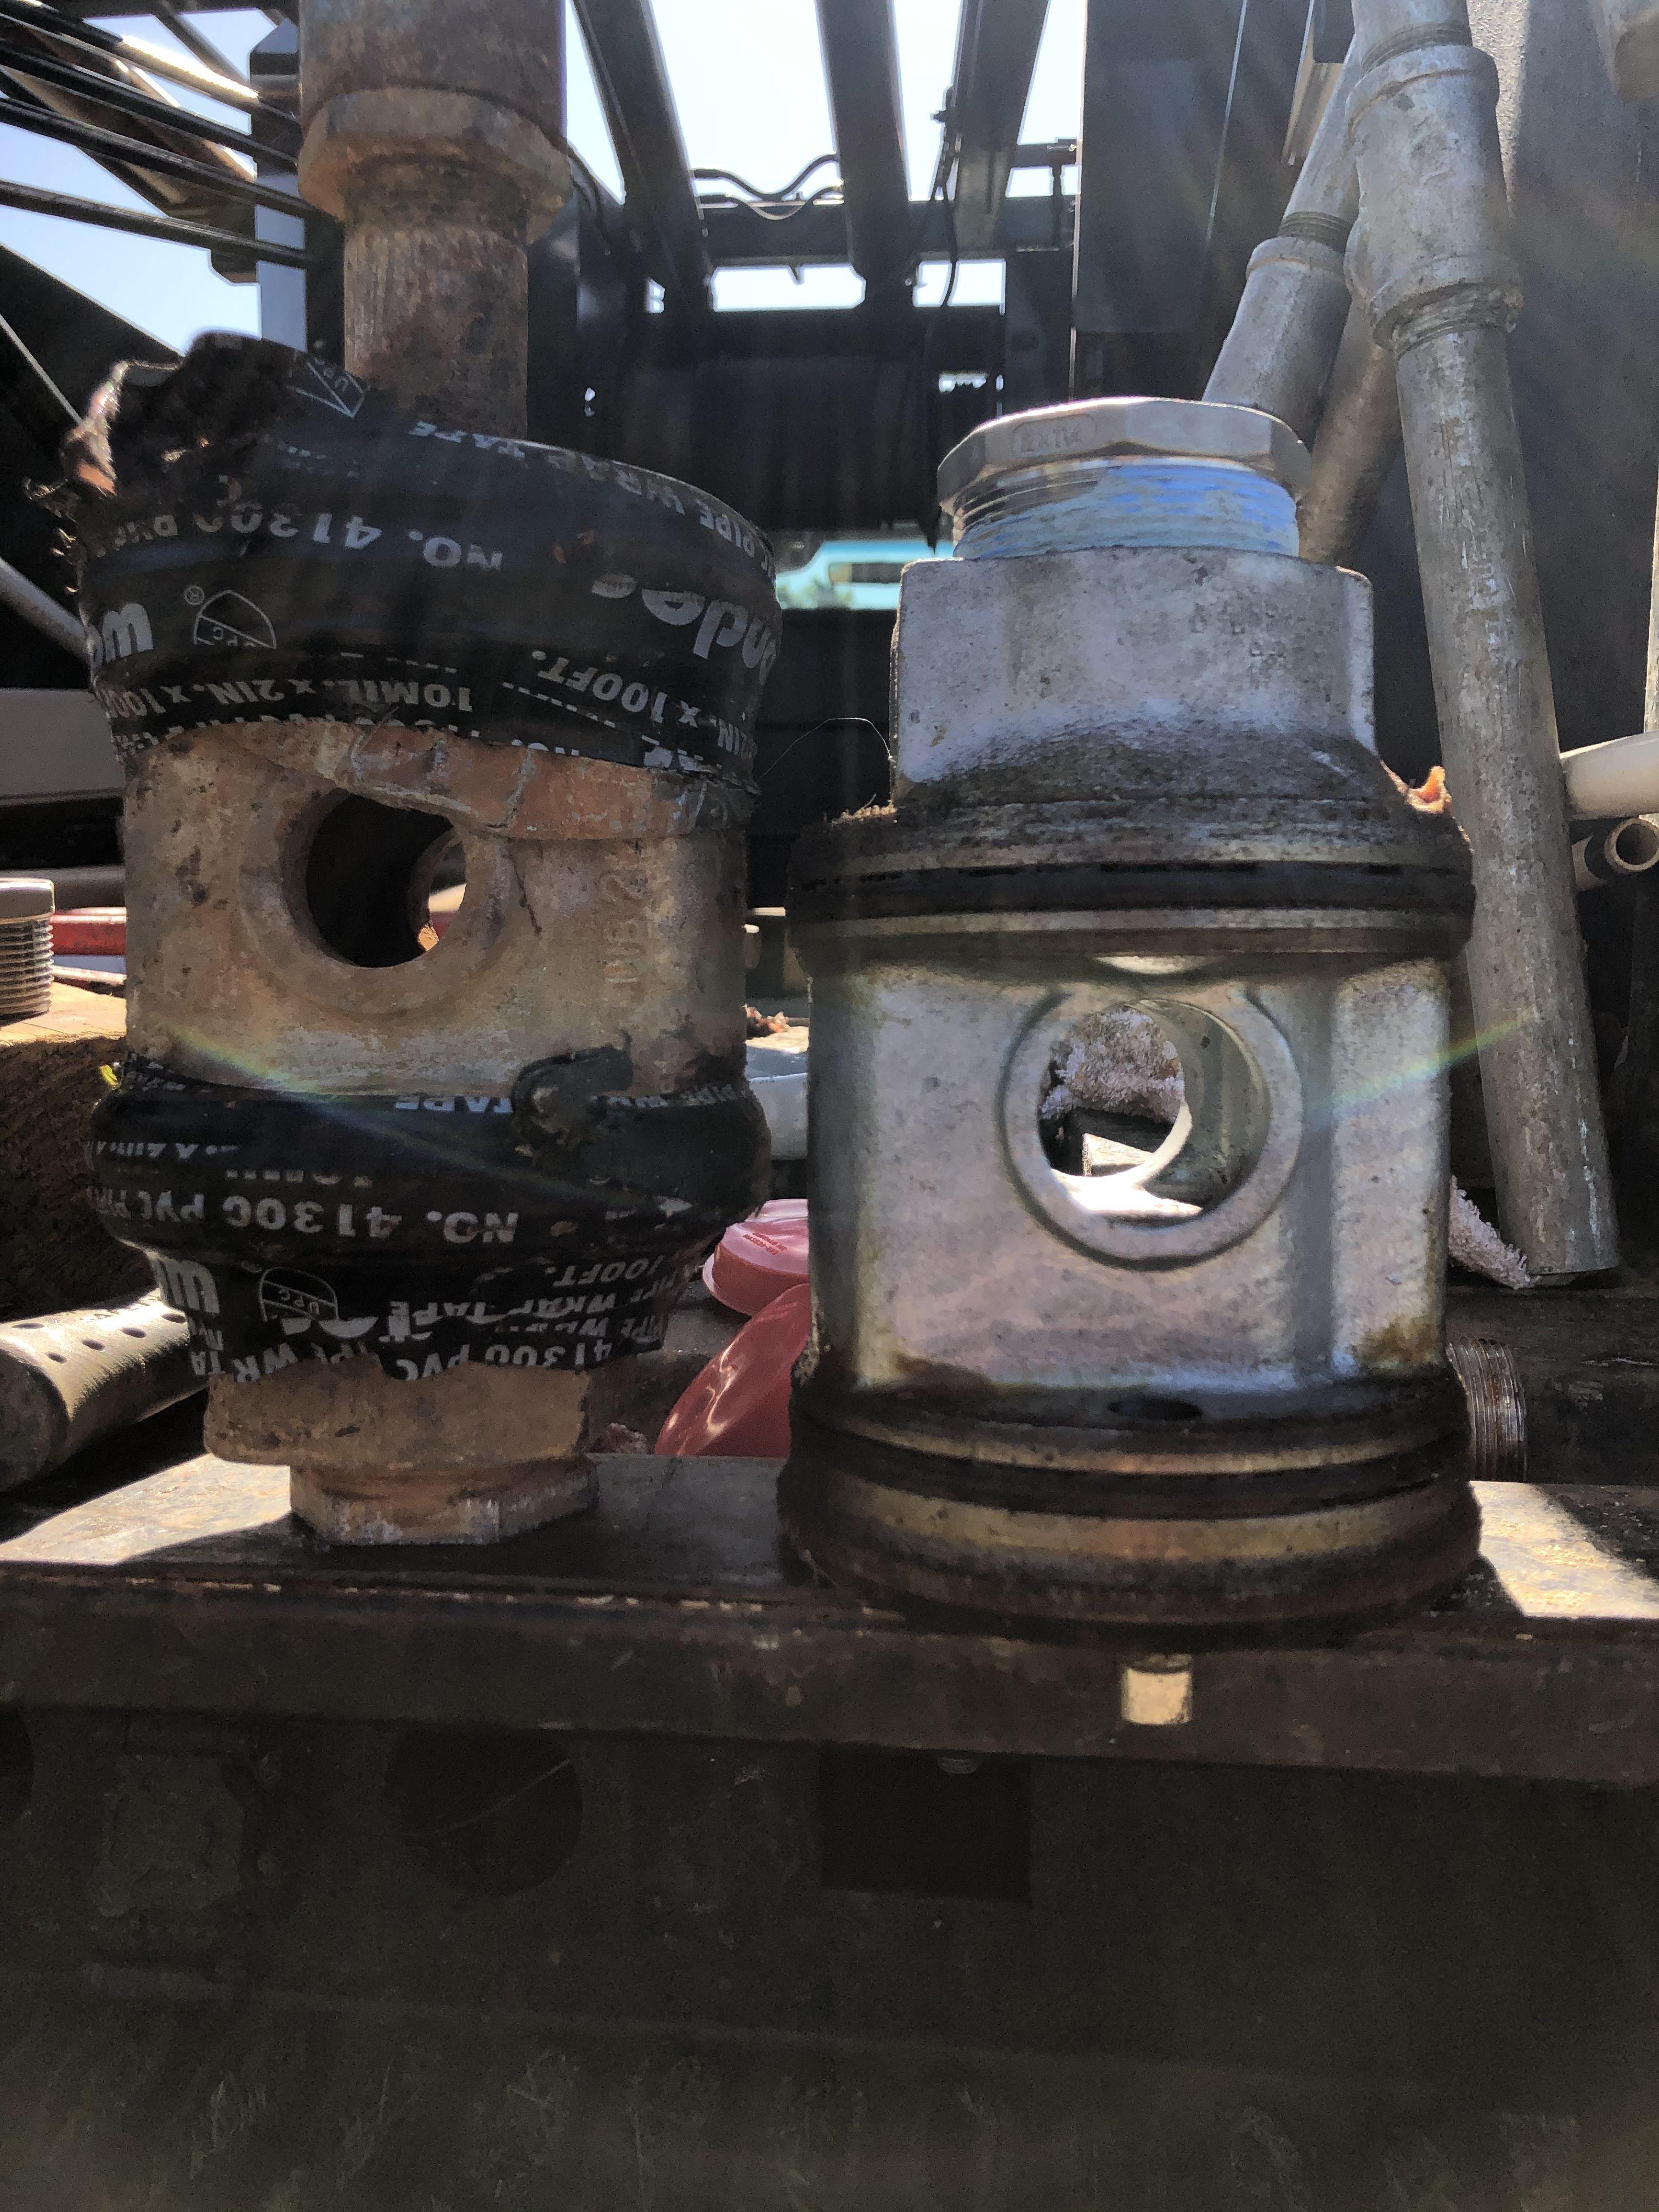 Pin on Pump Jobs and Repairs